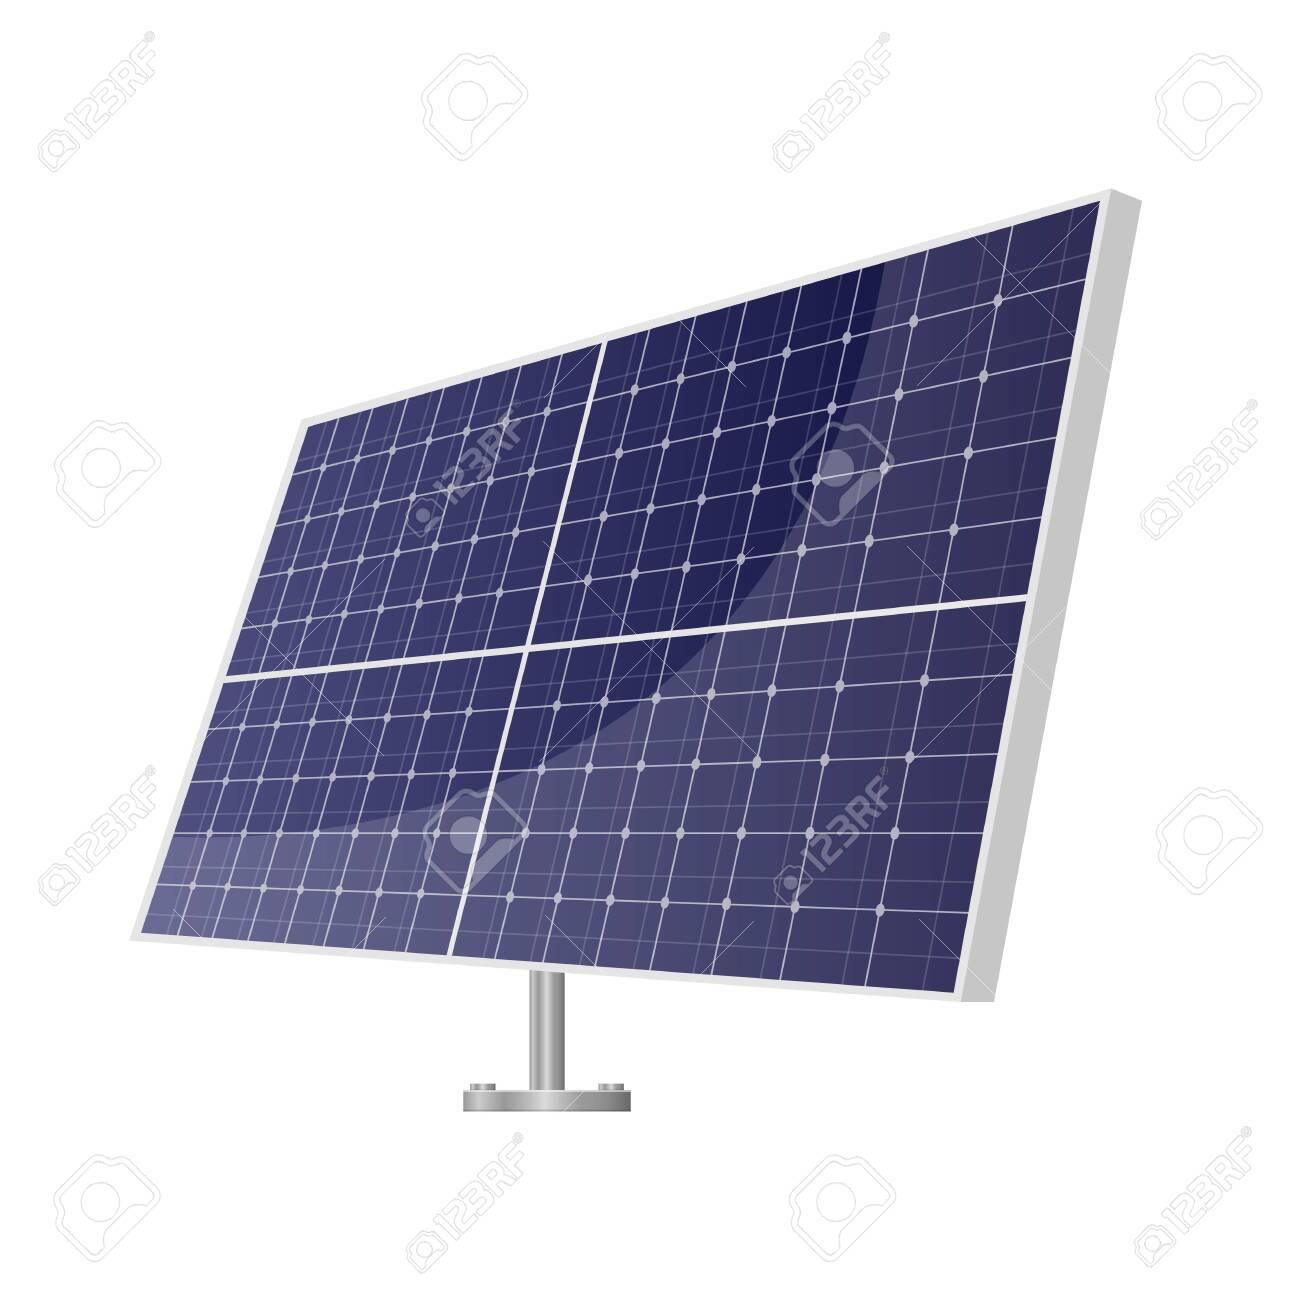 Solar panel vector design illustration isolated on white background - 151185194